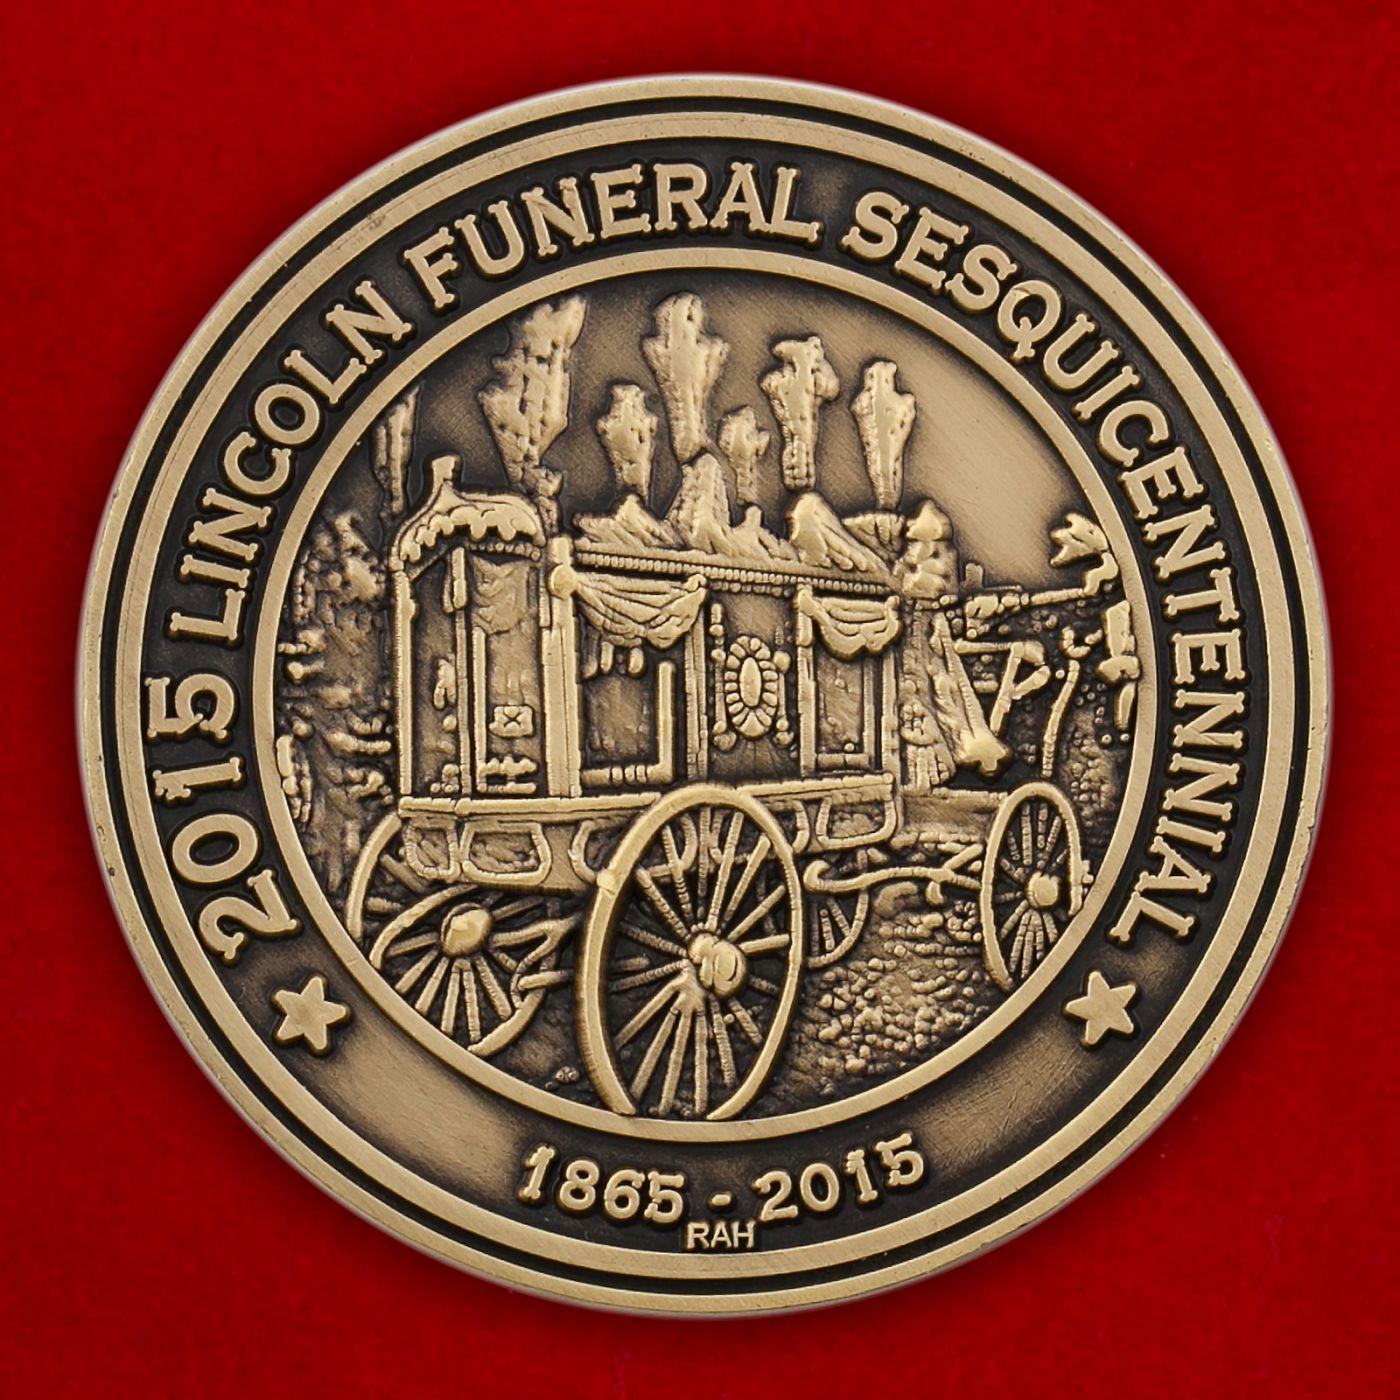 Челлендж коин к 150-летию смерти Авраама Линкольна